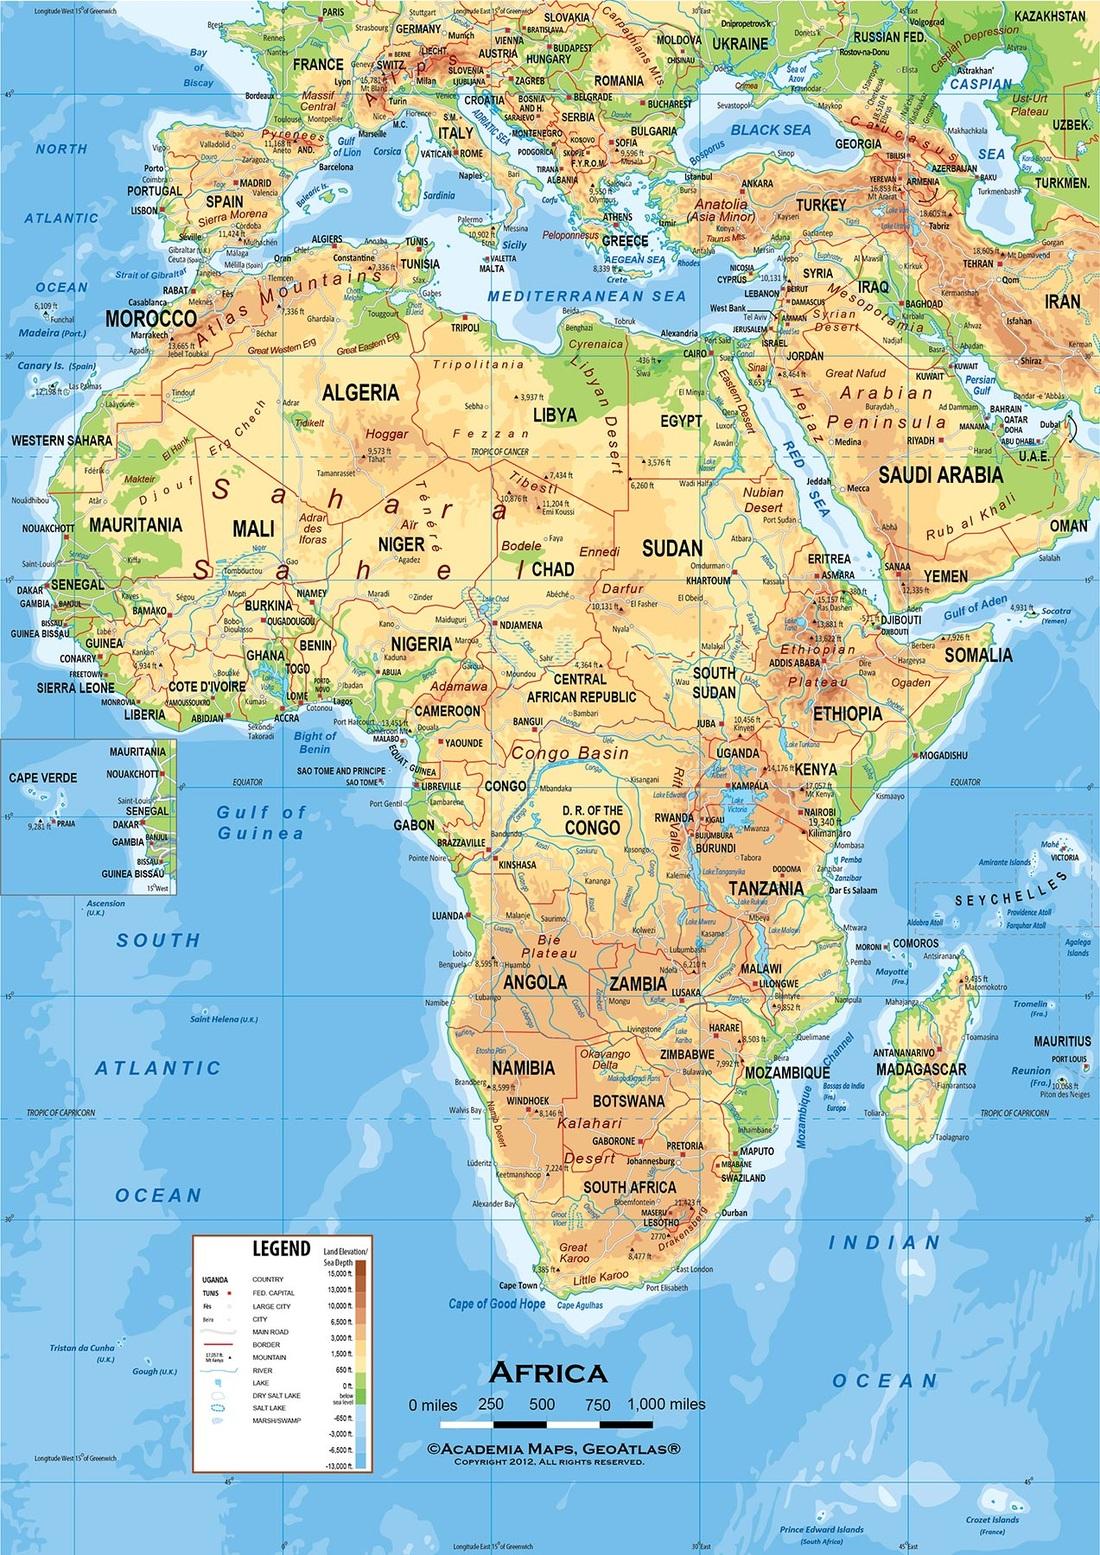 Sub Sahara Africa